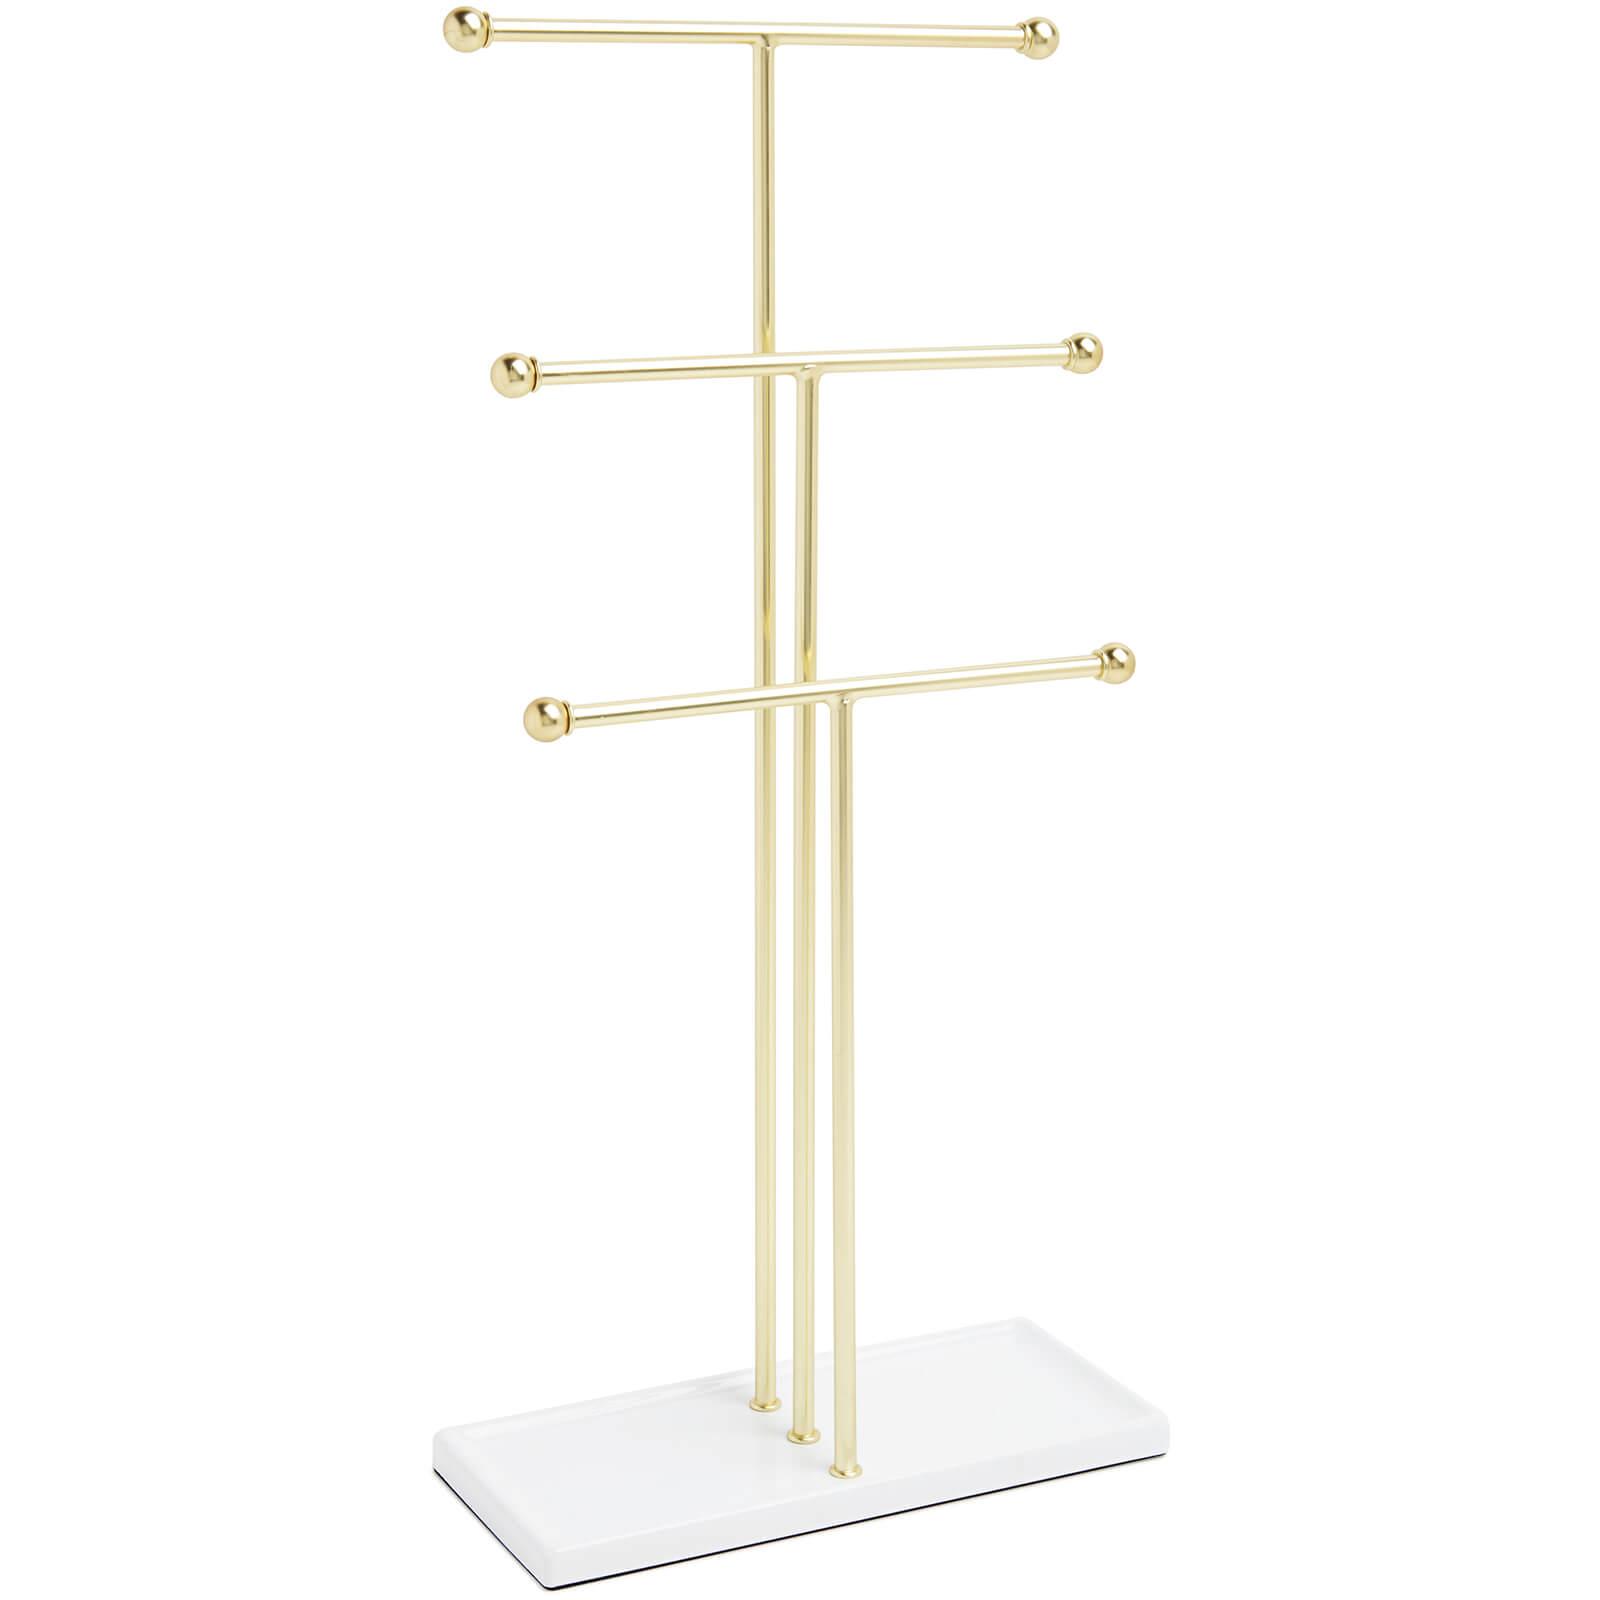 Umbra Trigem Jewellery Stand - White/Brass